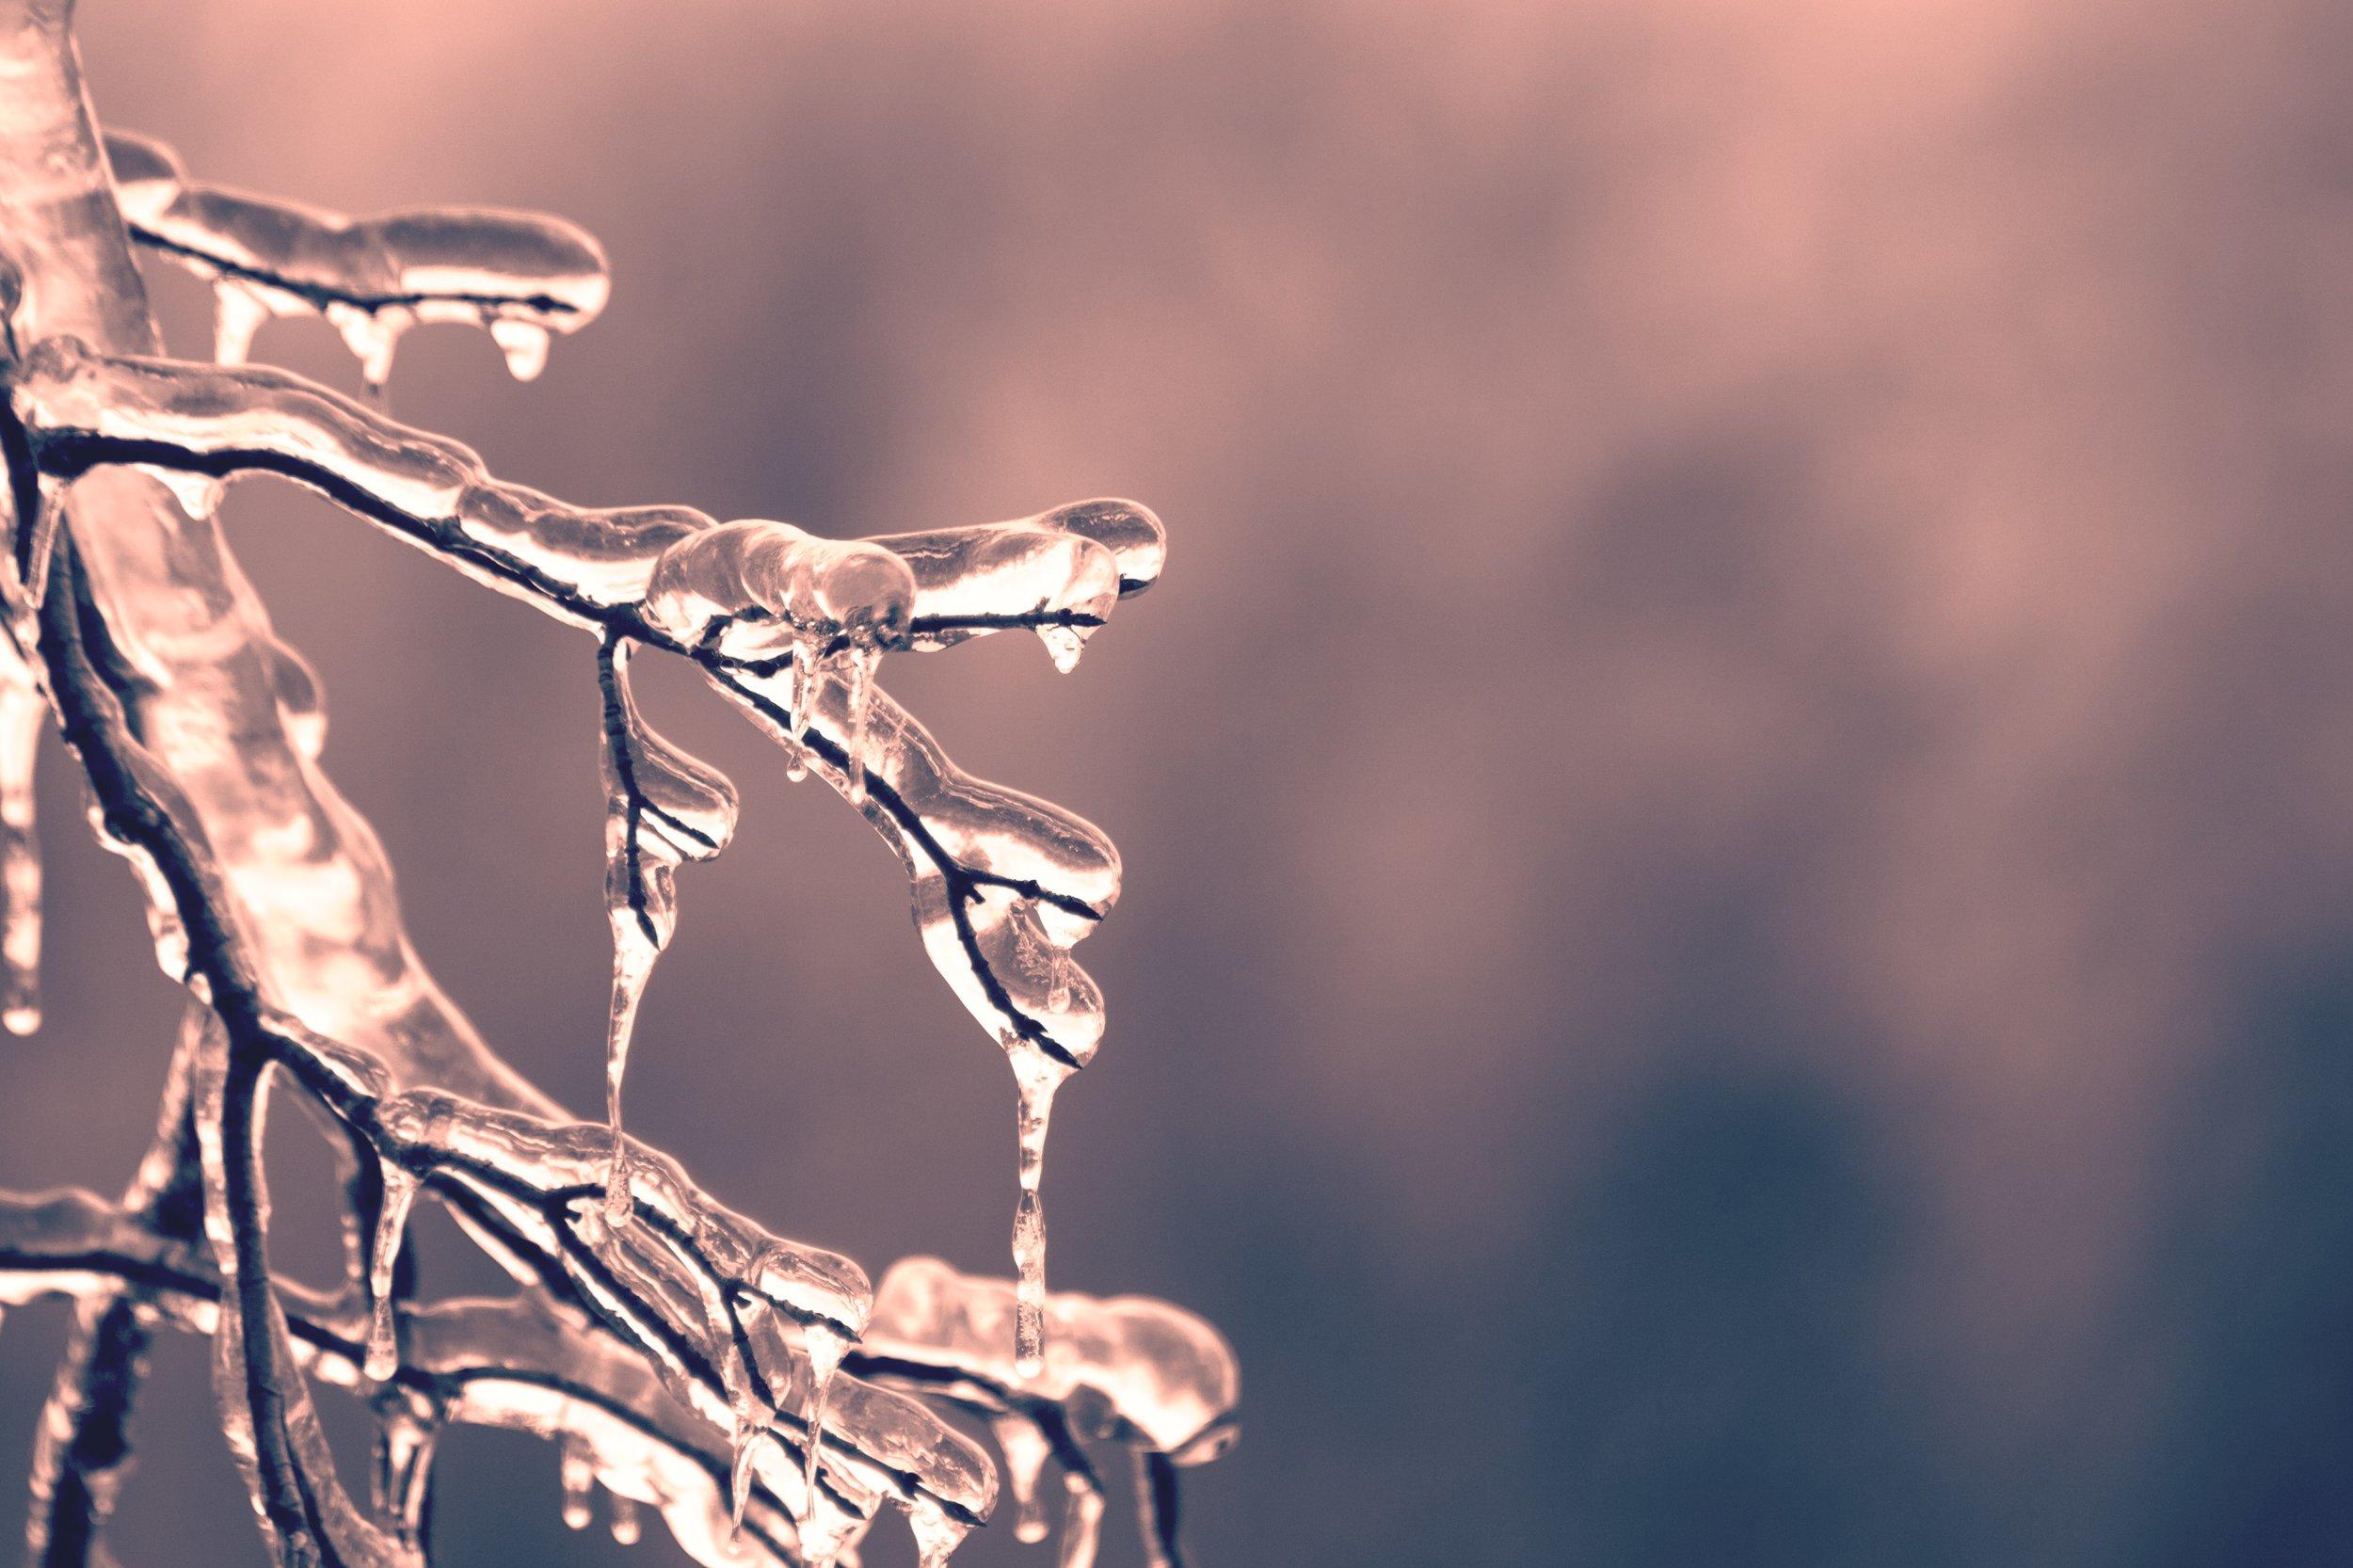 blur-branch-close-up-436792.jpg